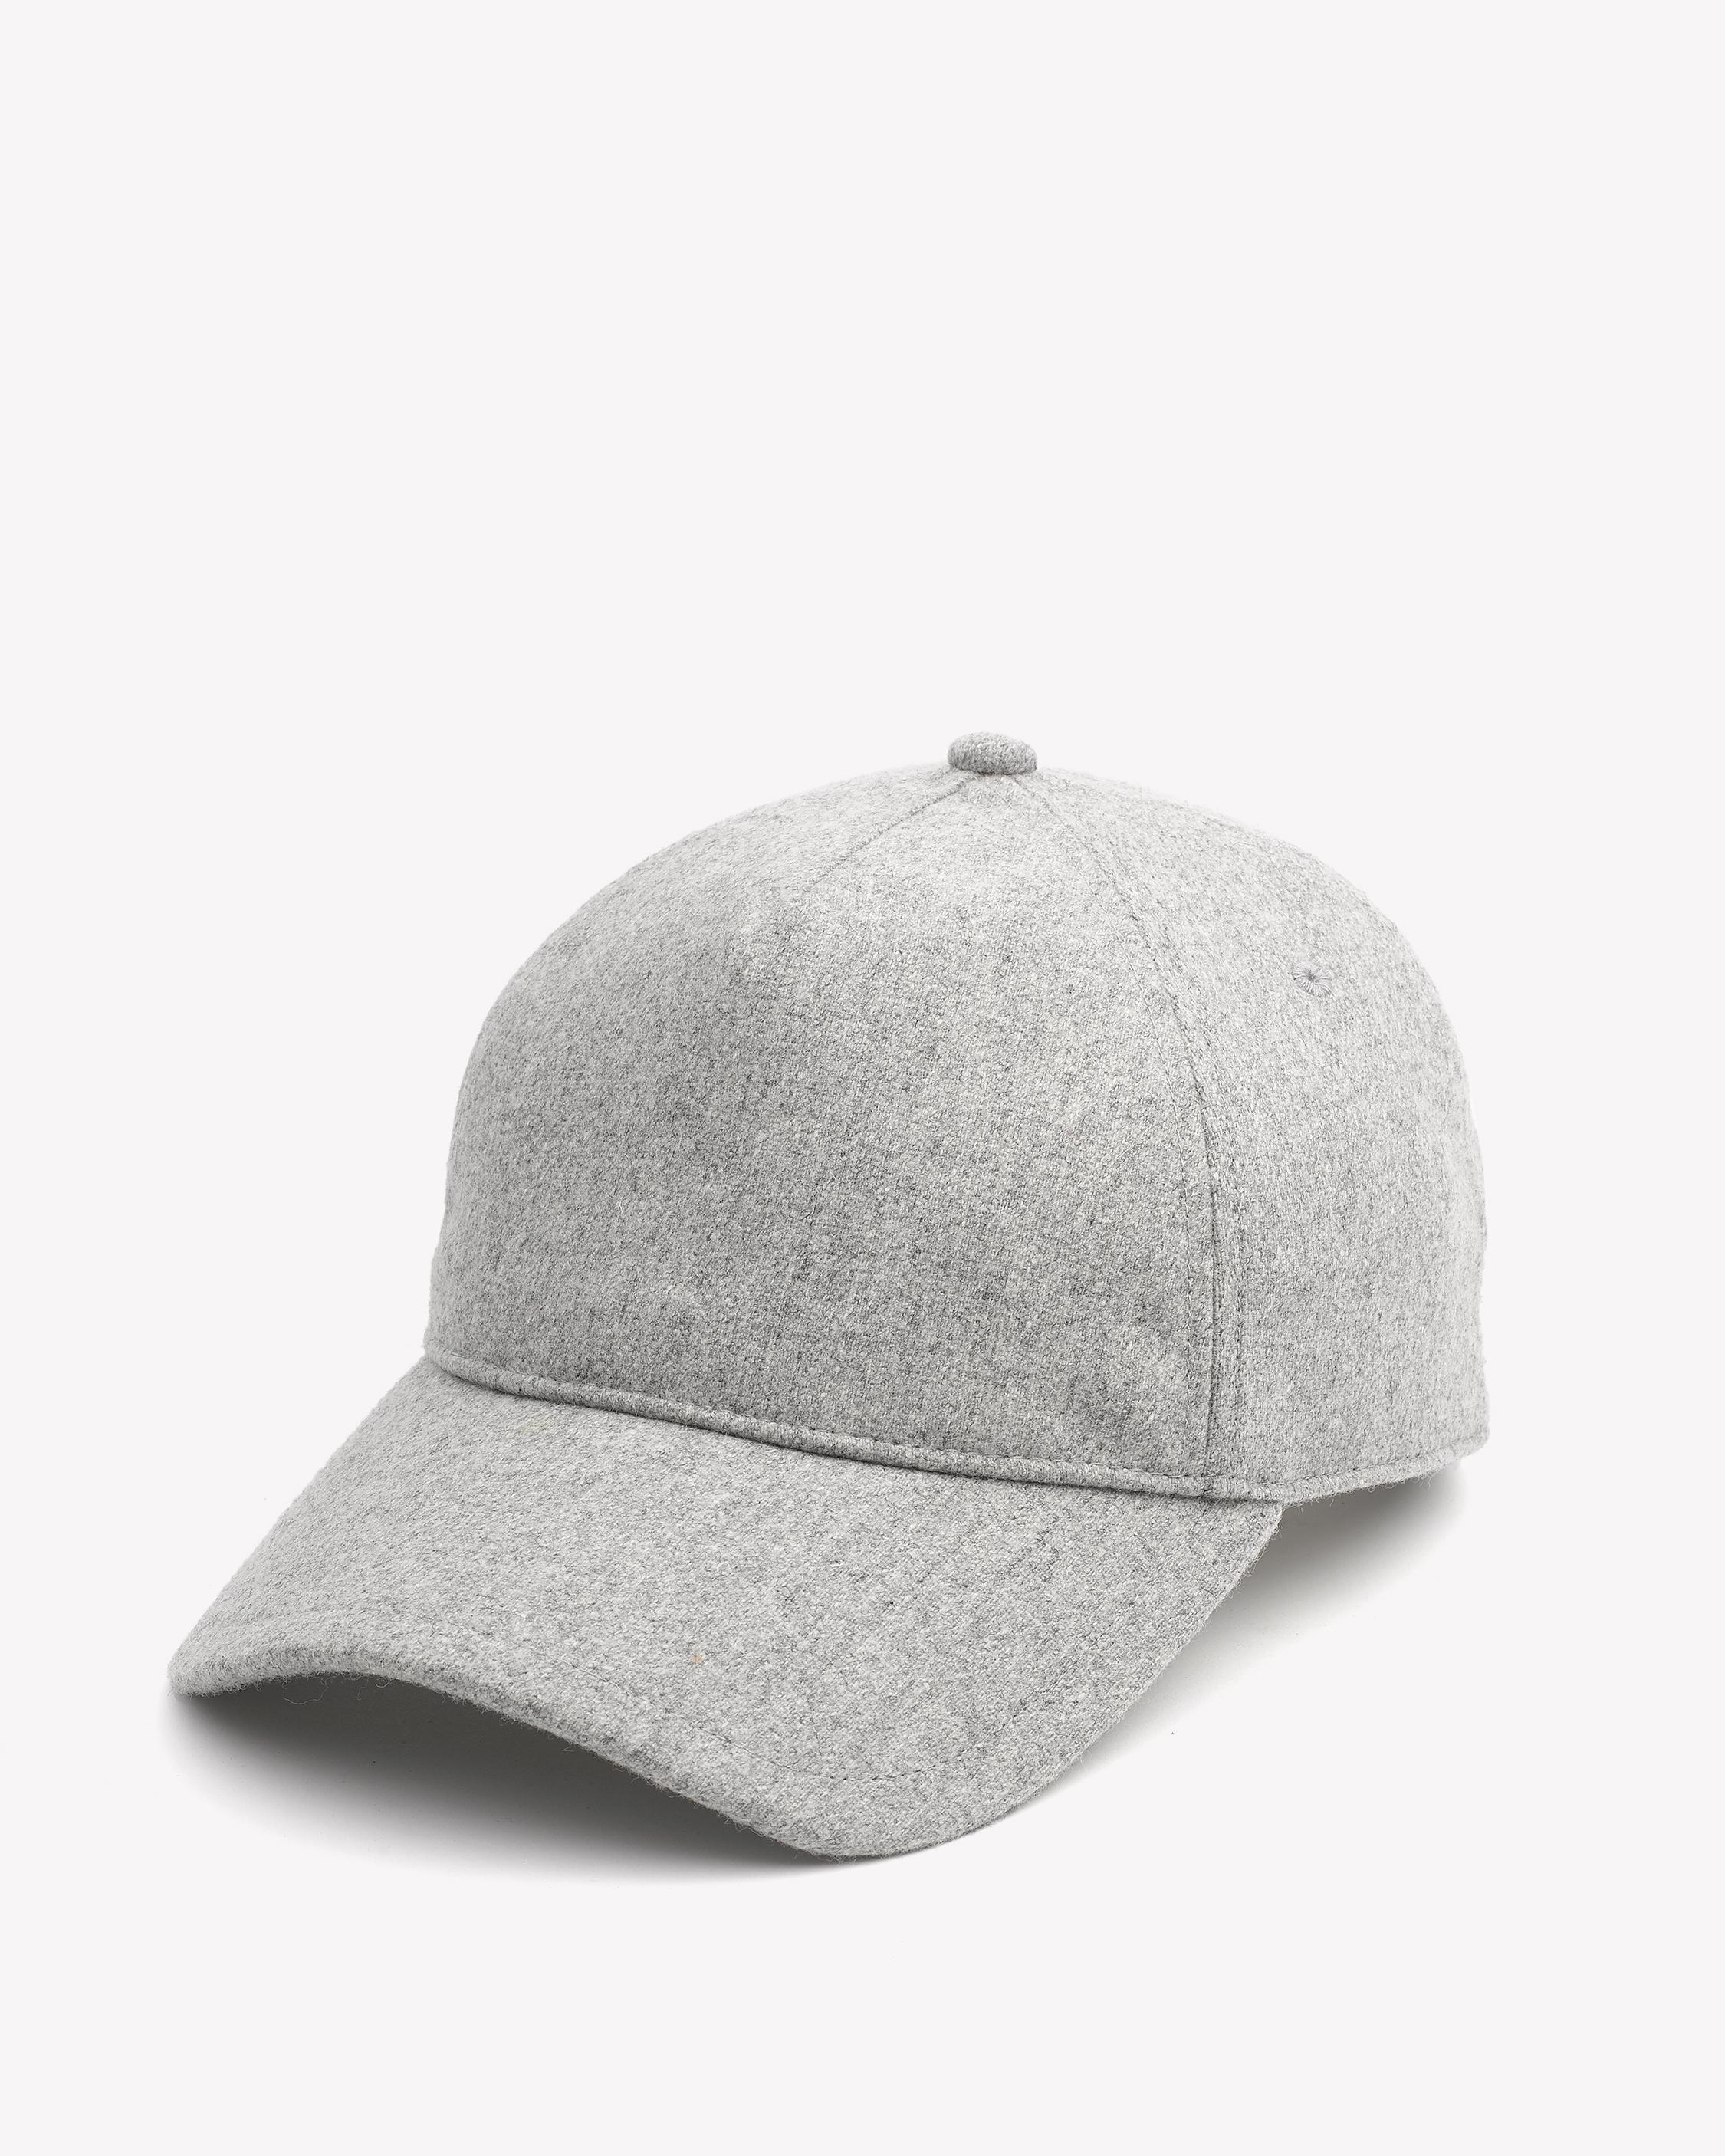 61dbed54058 Marilyn Baseball Cap